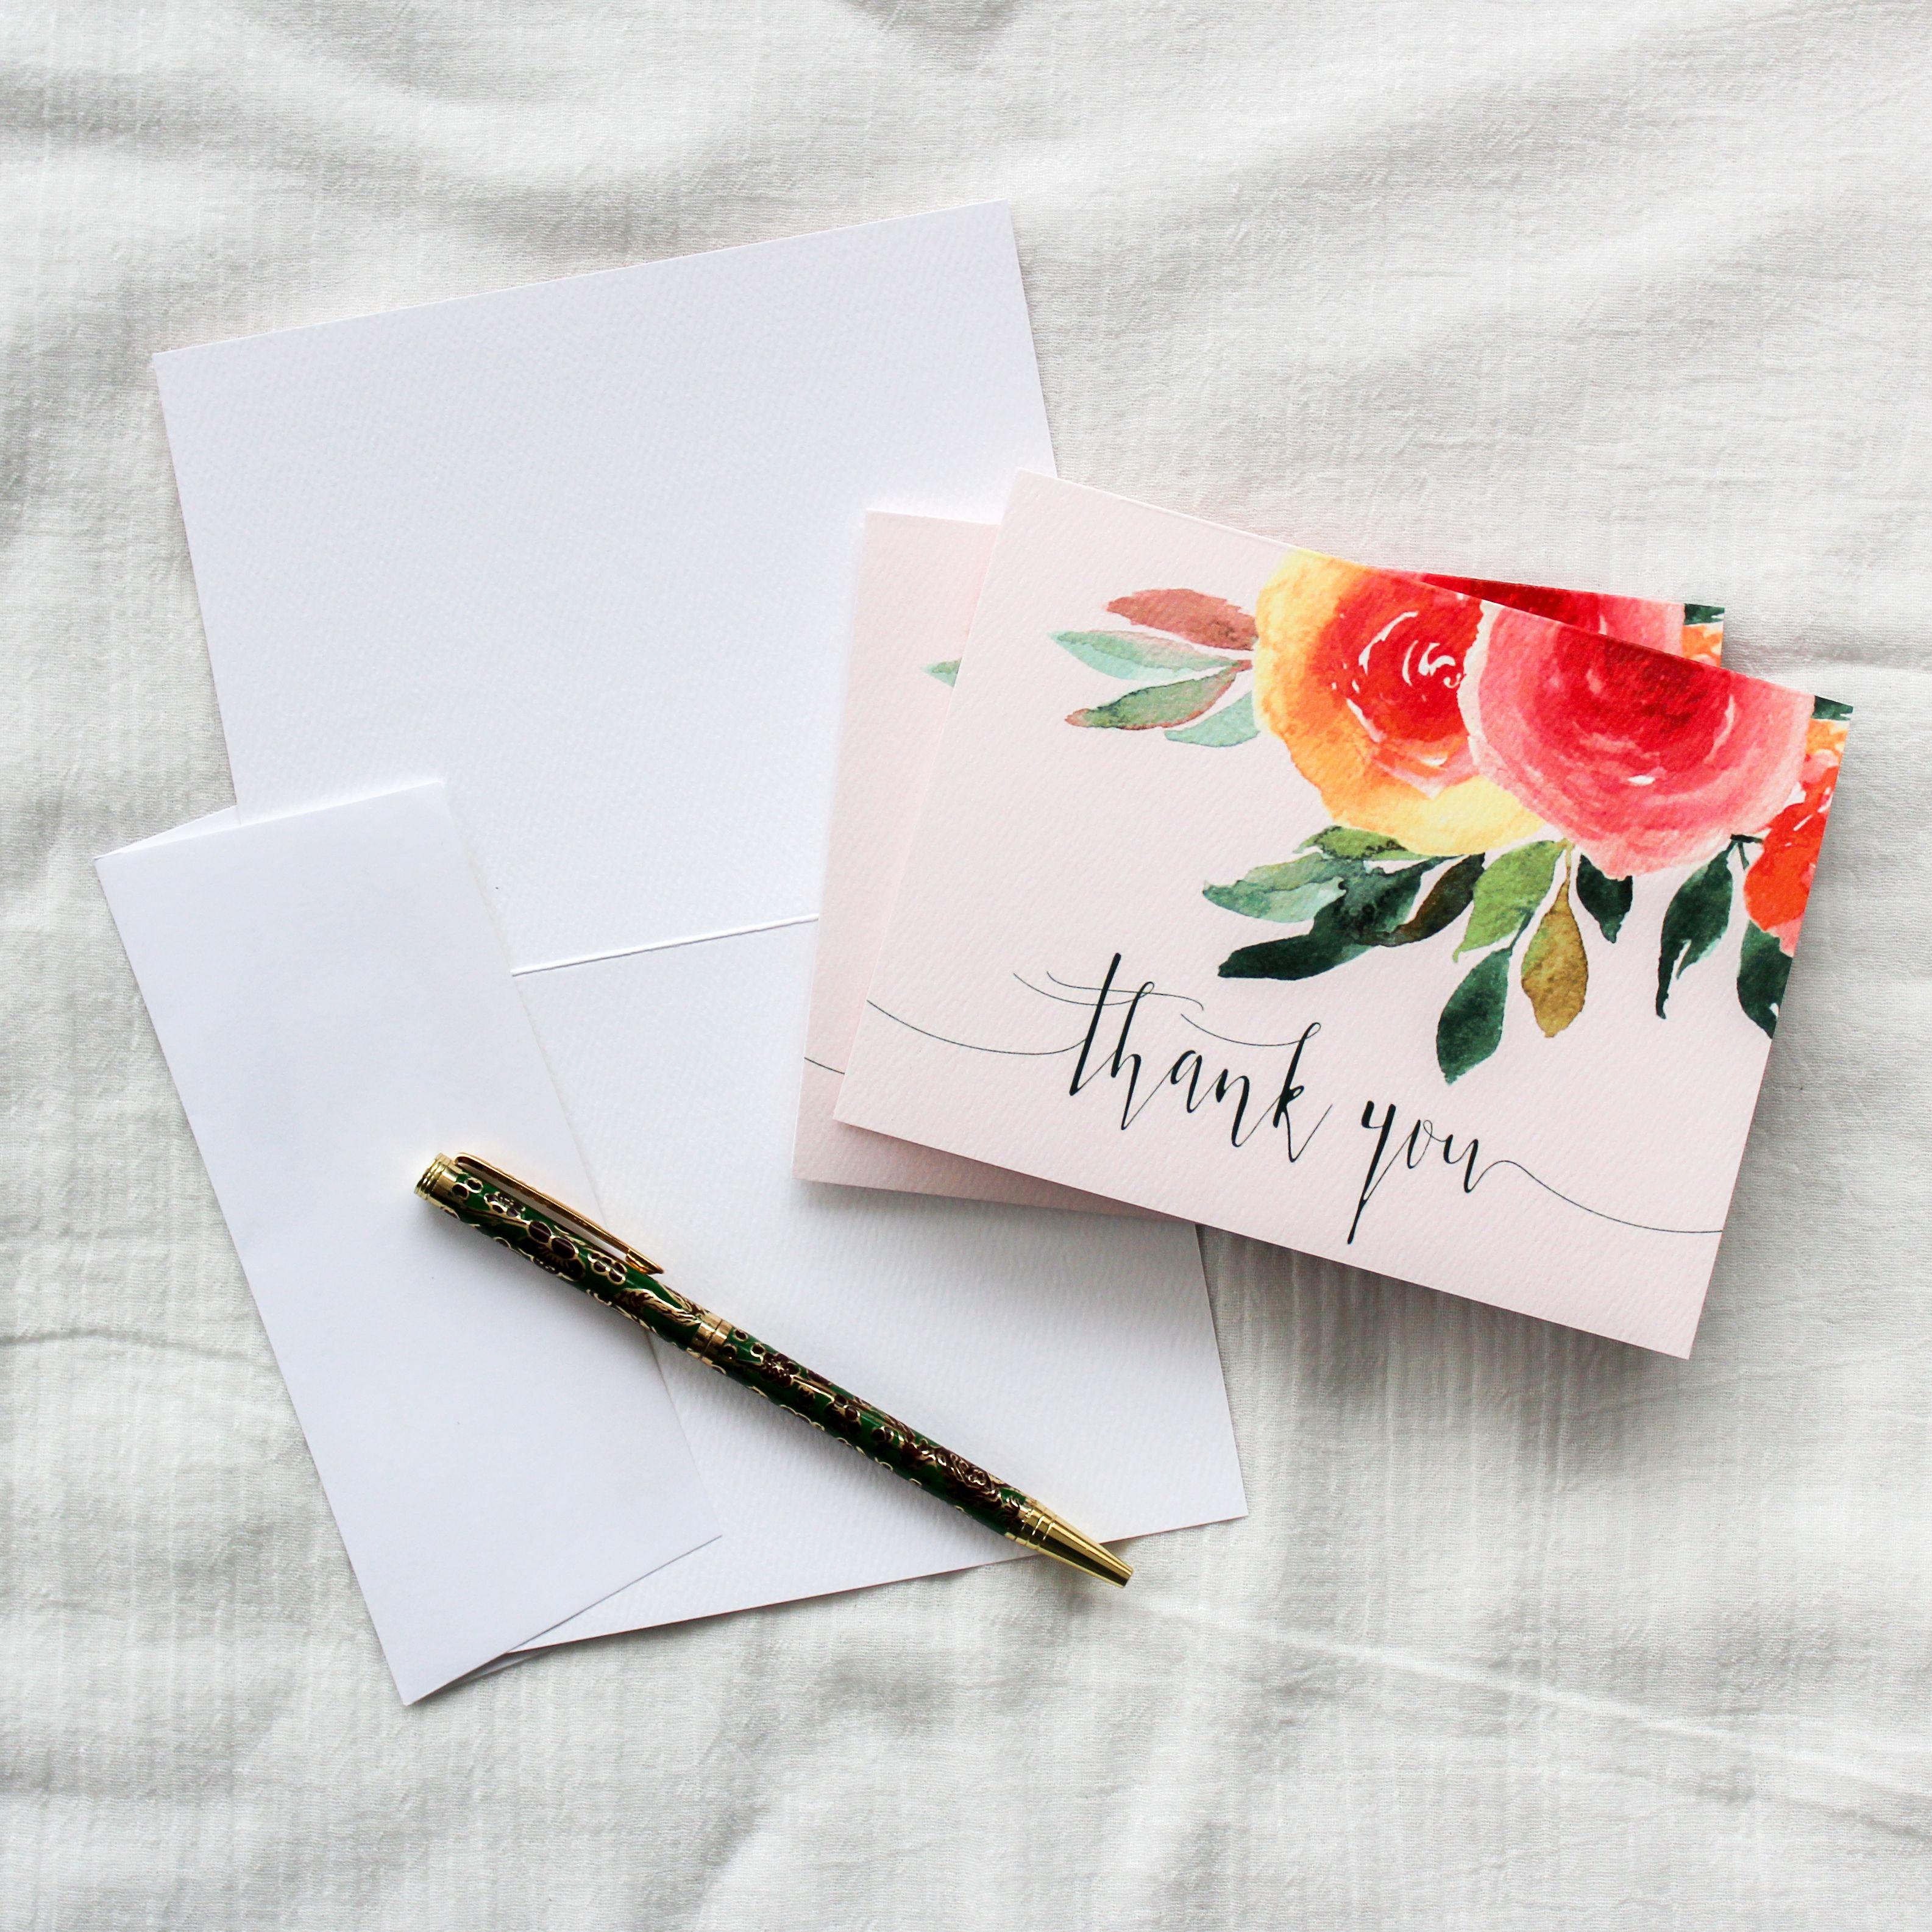 Felt Cardstock Fl Greeting Cards